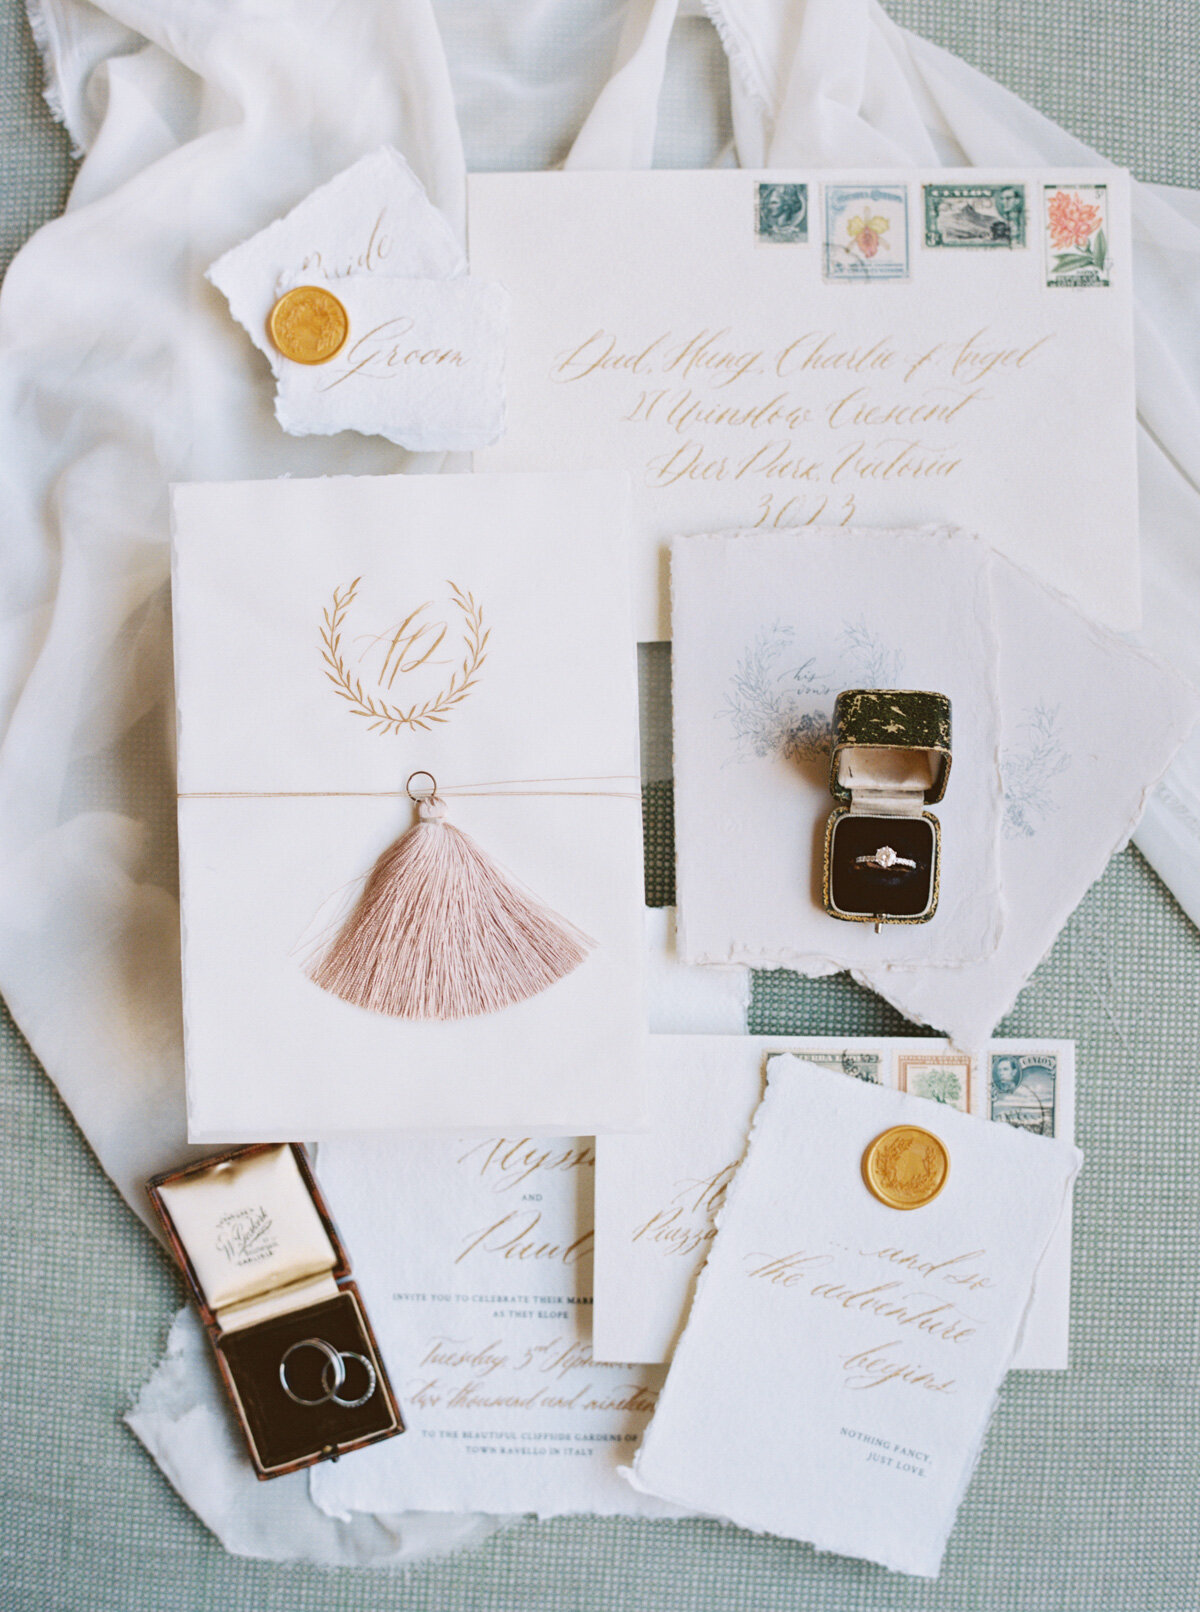 Belmond-Hotel-Caruso-ravello-elopement-Katie-Grant-destination-wedding (3 of 50).jpg